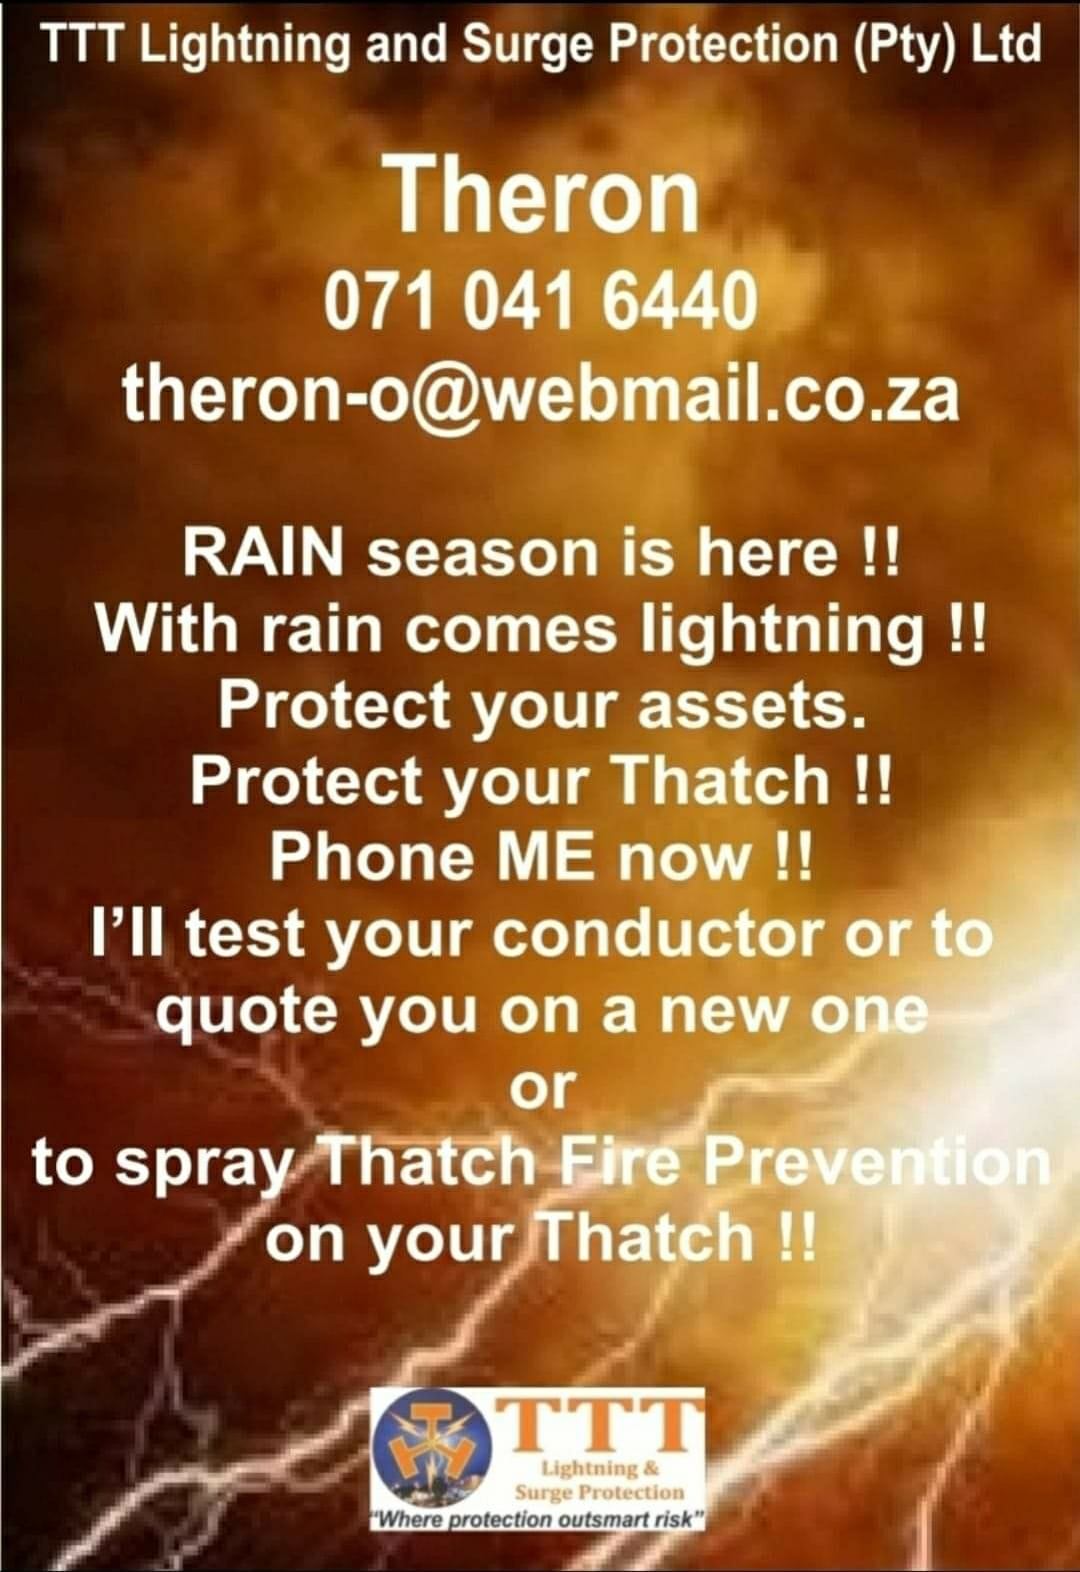 TTT Lightning & Surge Protection